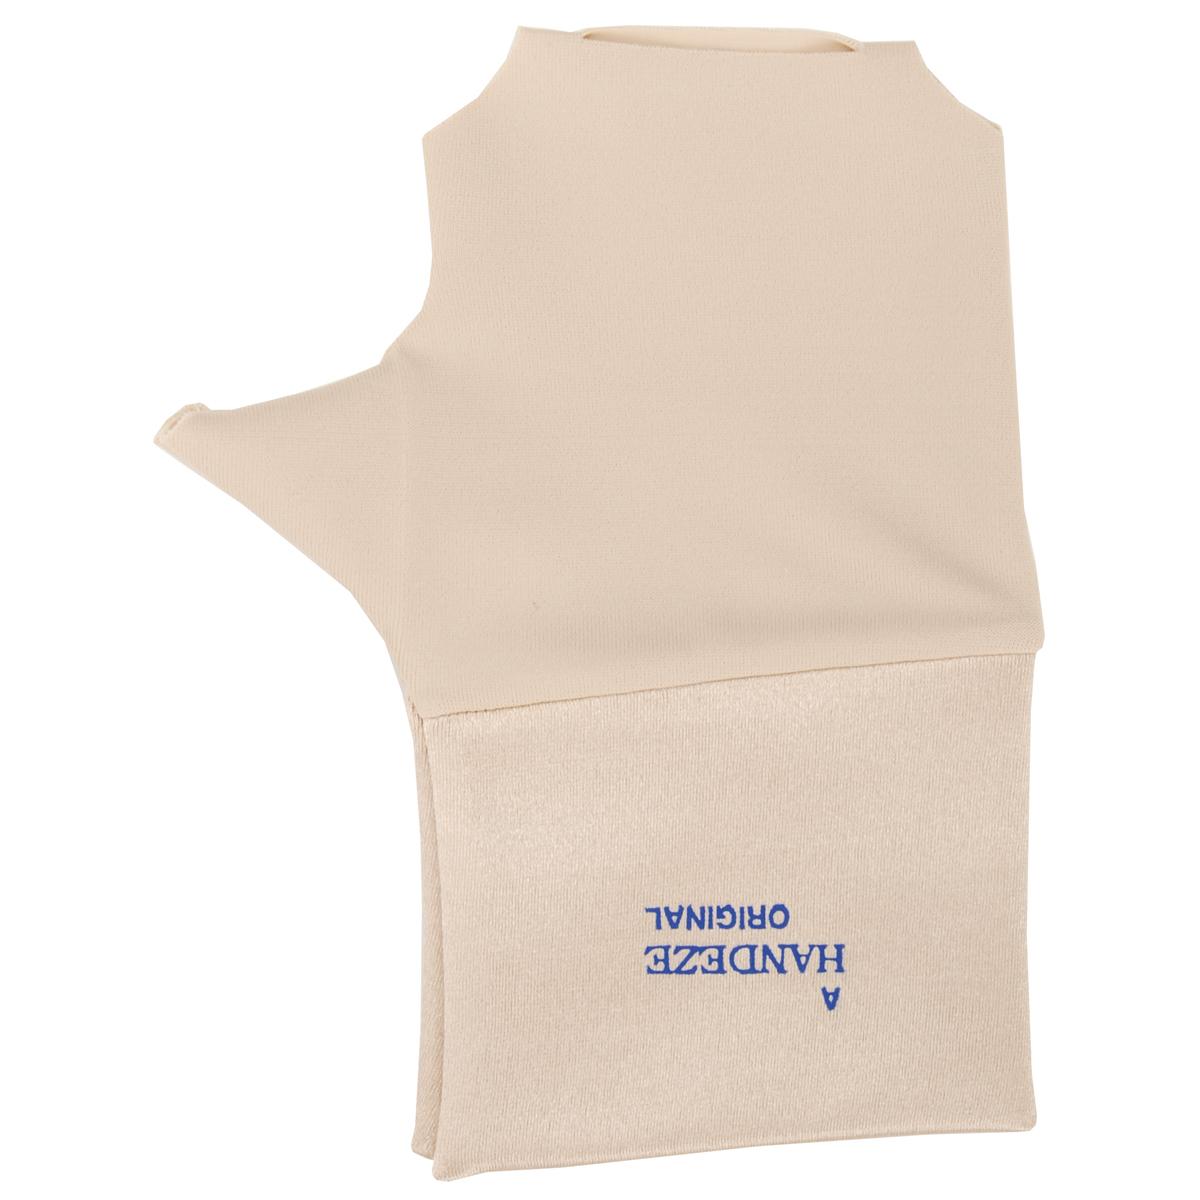 Handeze Therapeutic Craft Gloves - Single - Medium  (Sz. 4)